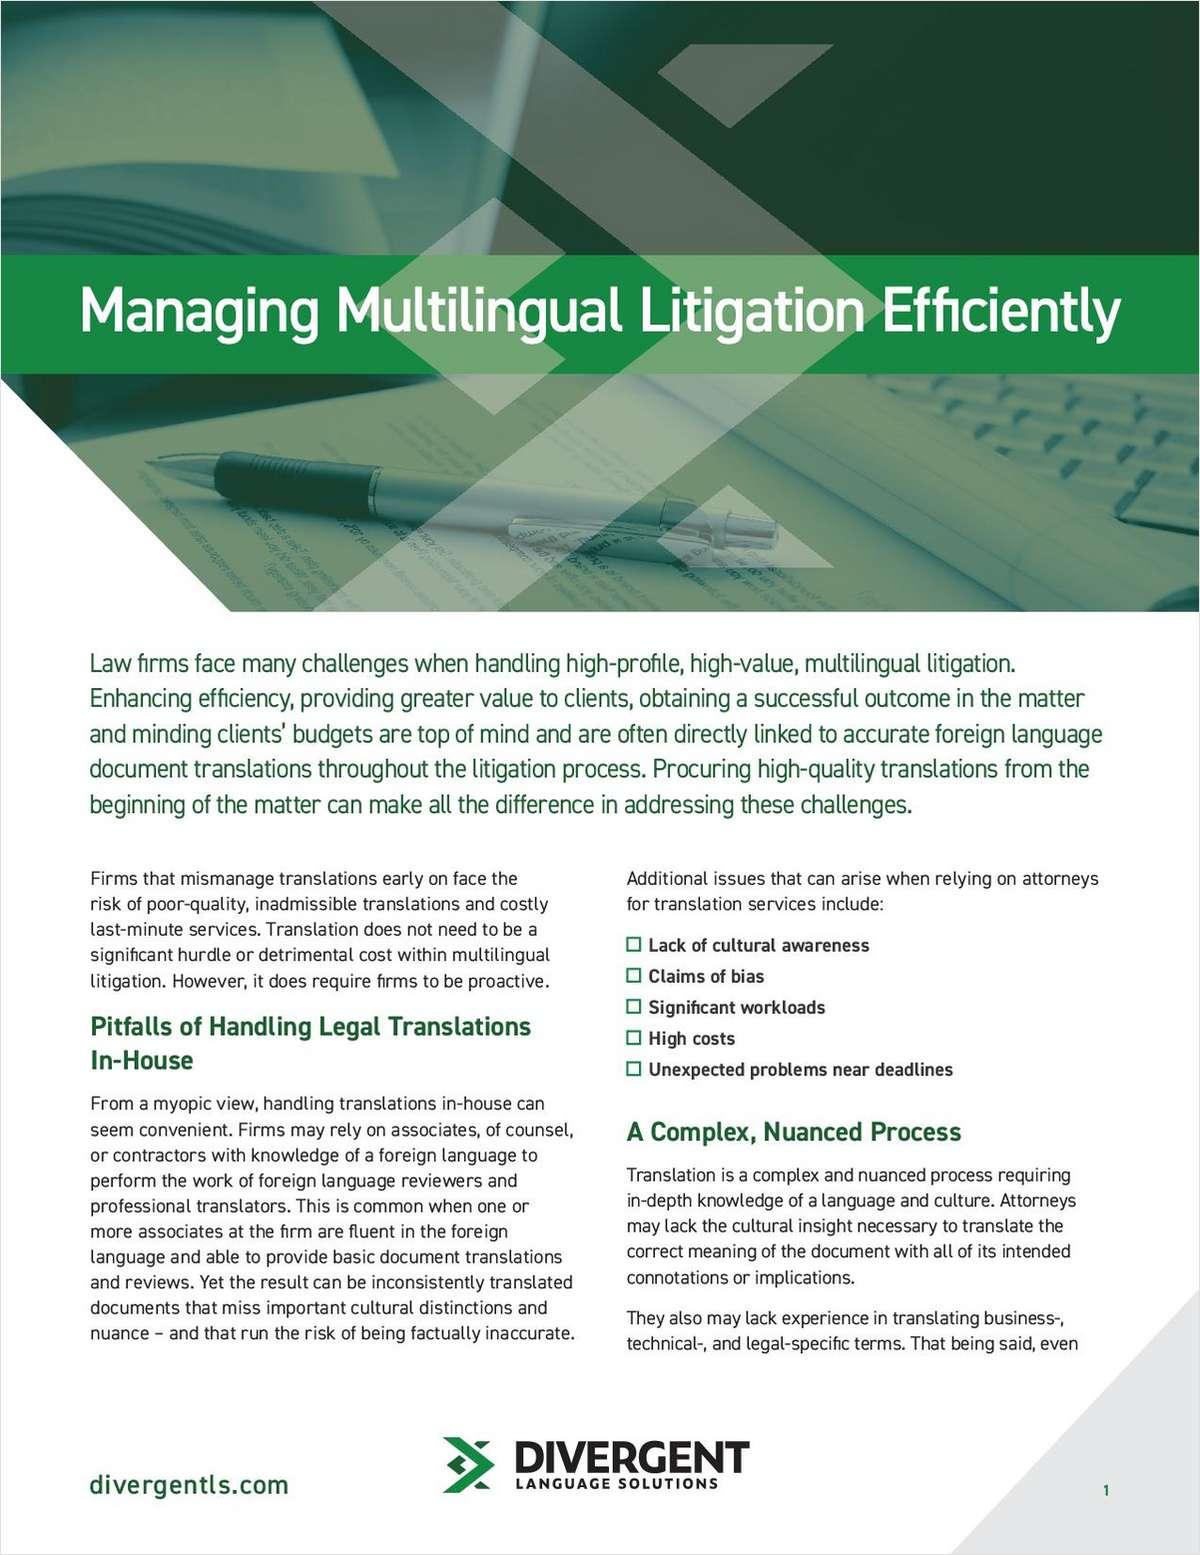 Managing Multilingual Litigation Efficiently